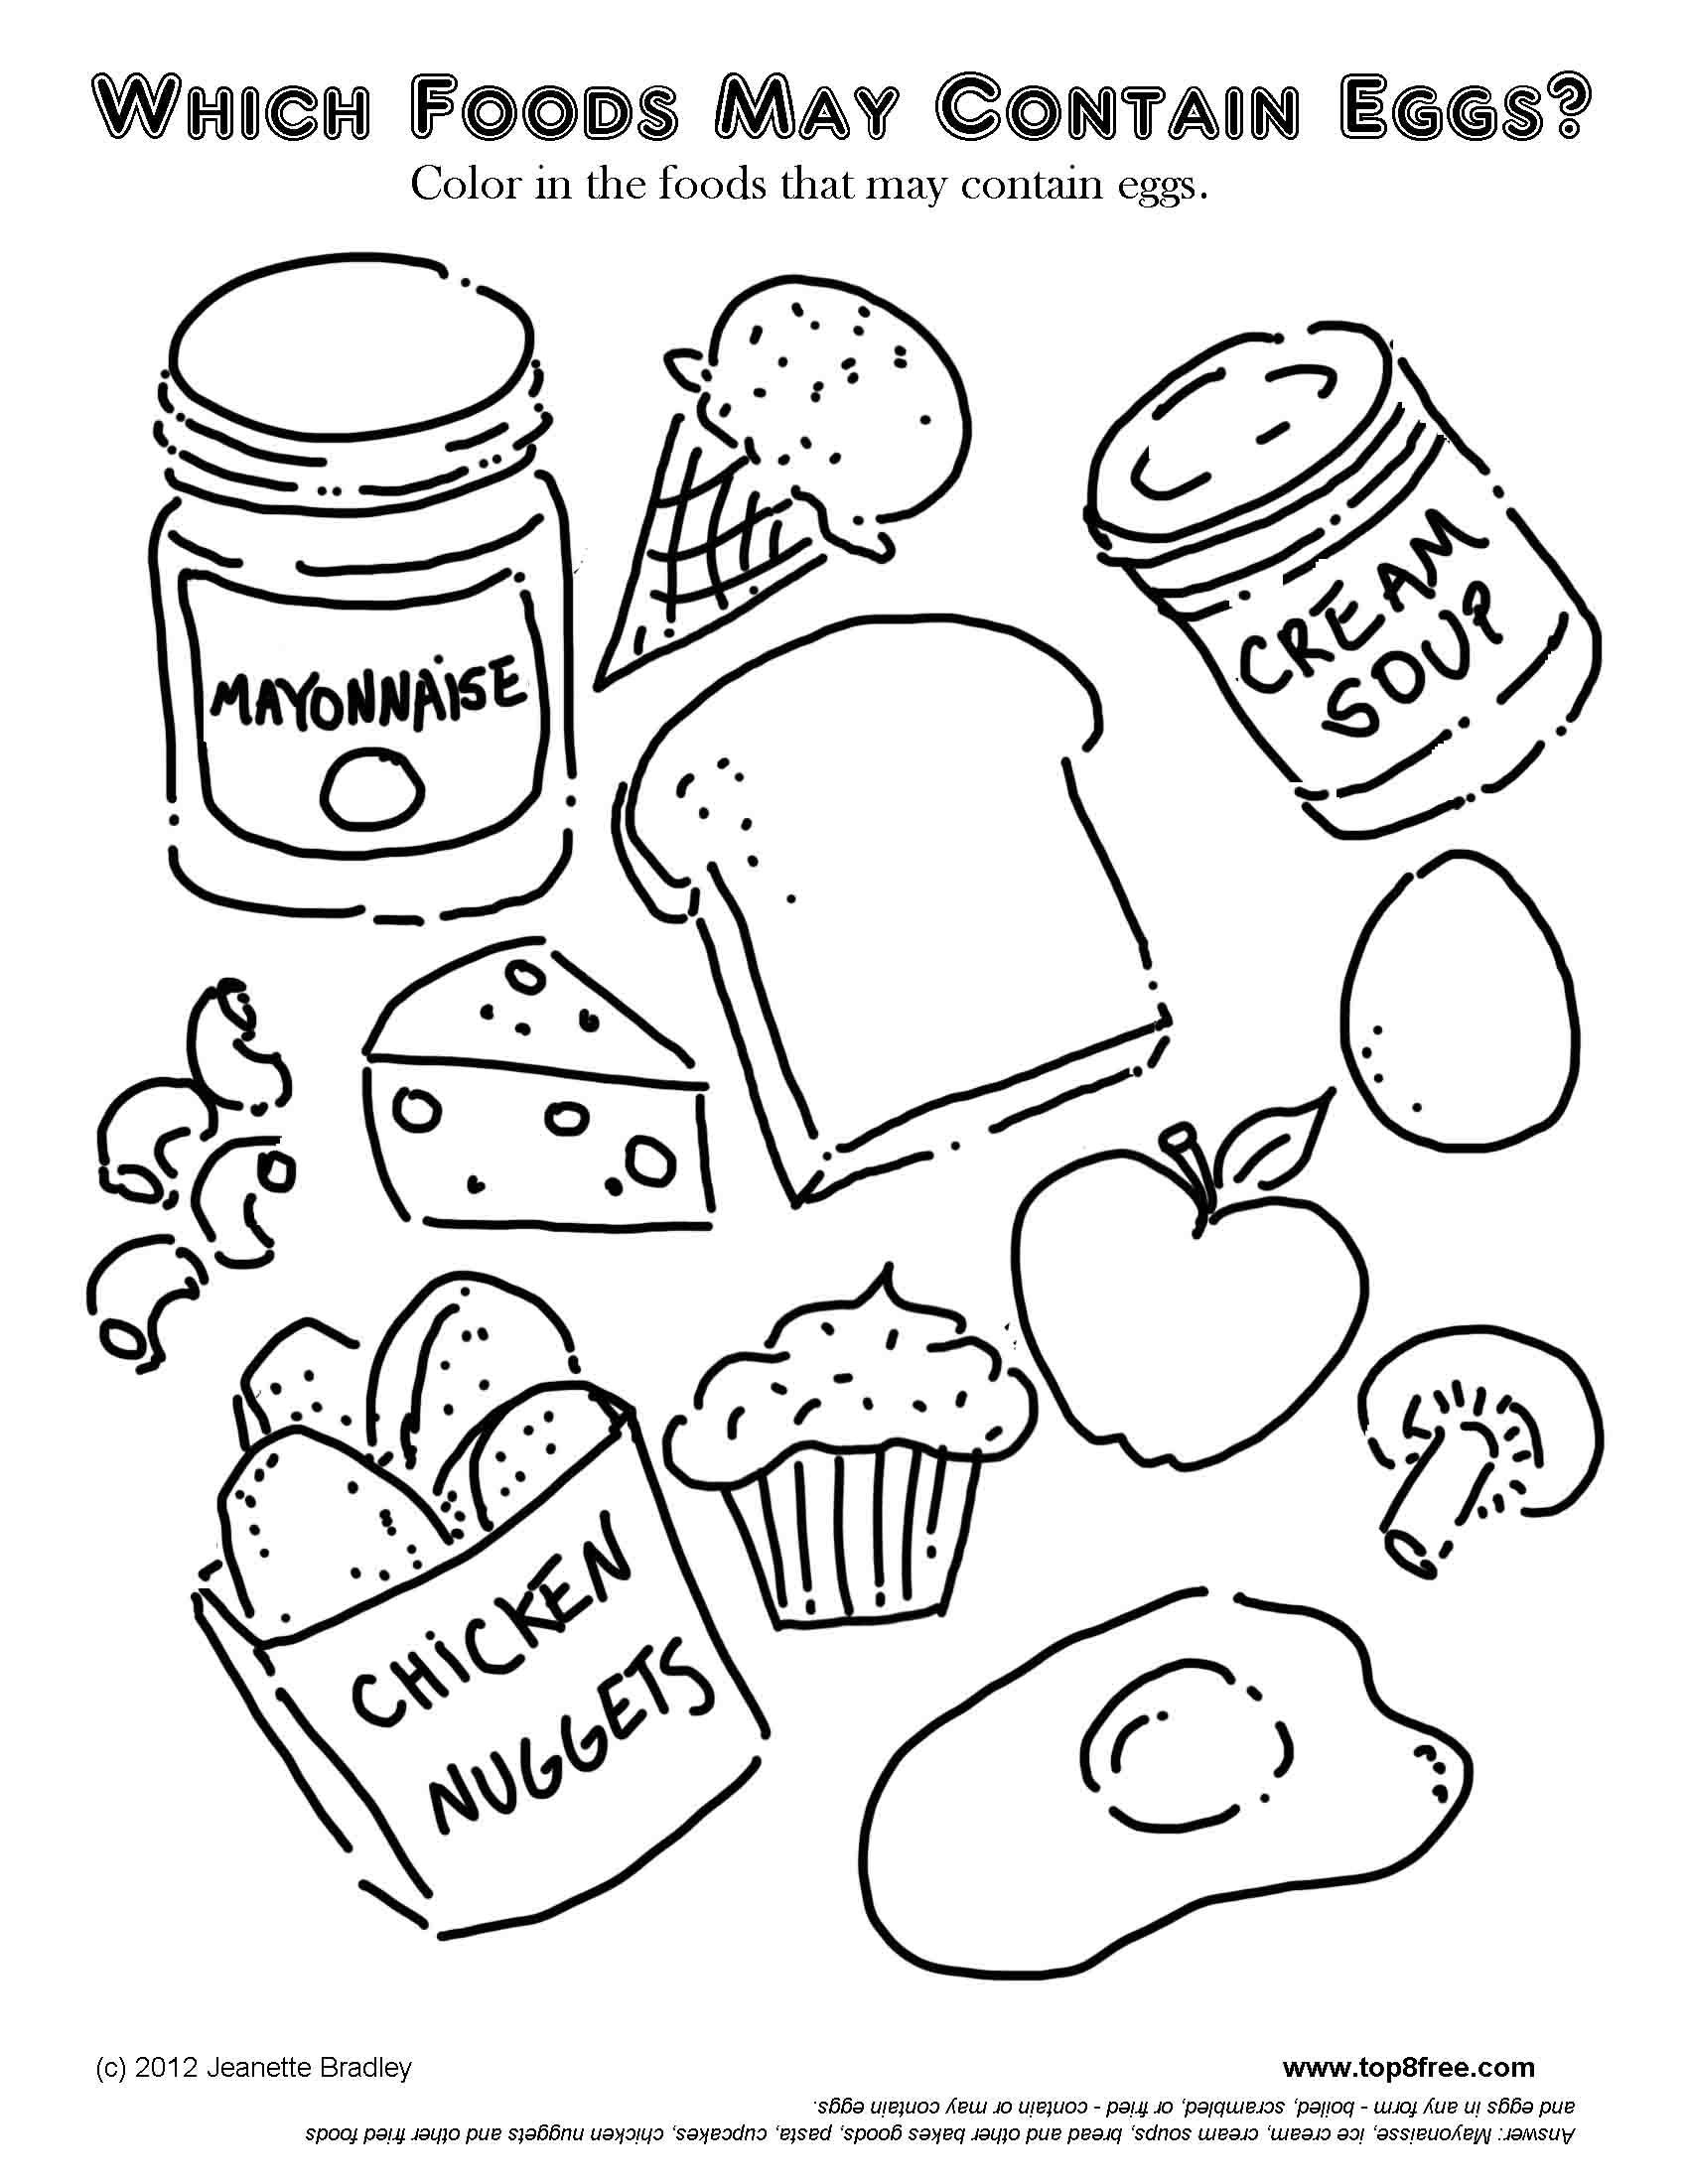 Free printable coloring pages food - Food Coloring Pages Printable Free High Quality Coloring Pages